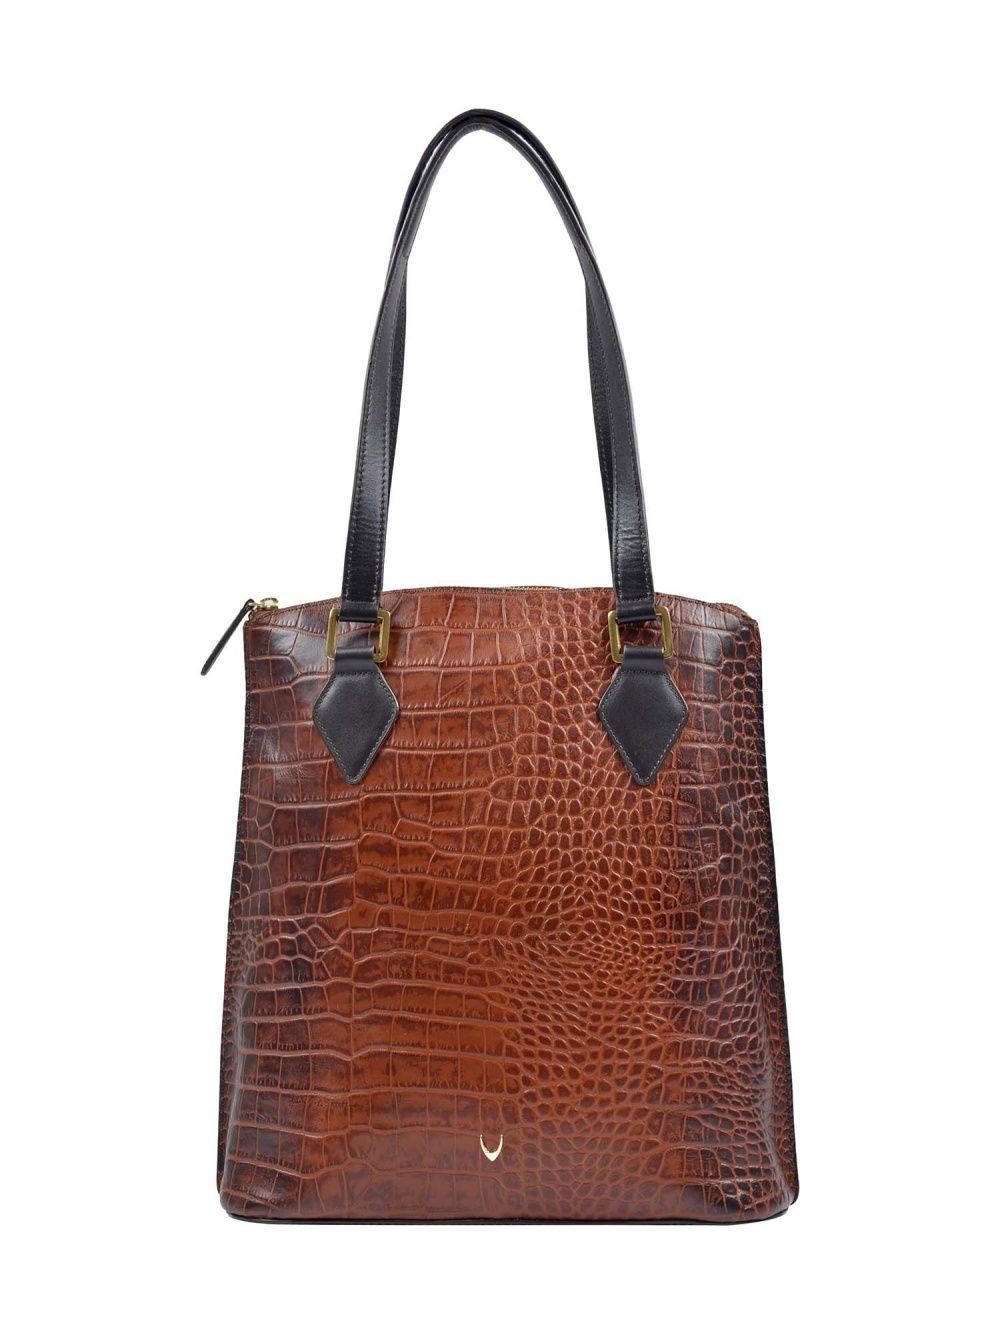 Hidesign Scorpio 01 Sb Tan Women S Handbag